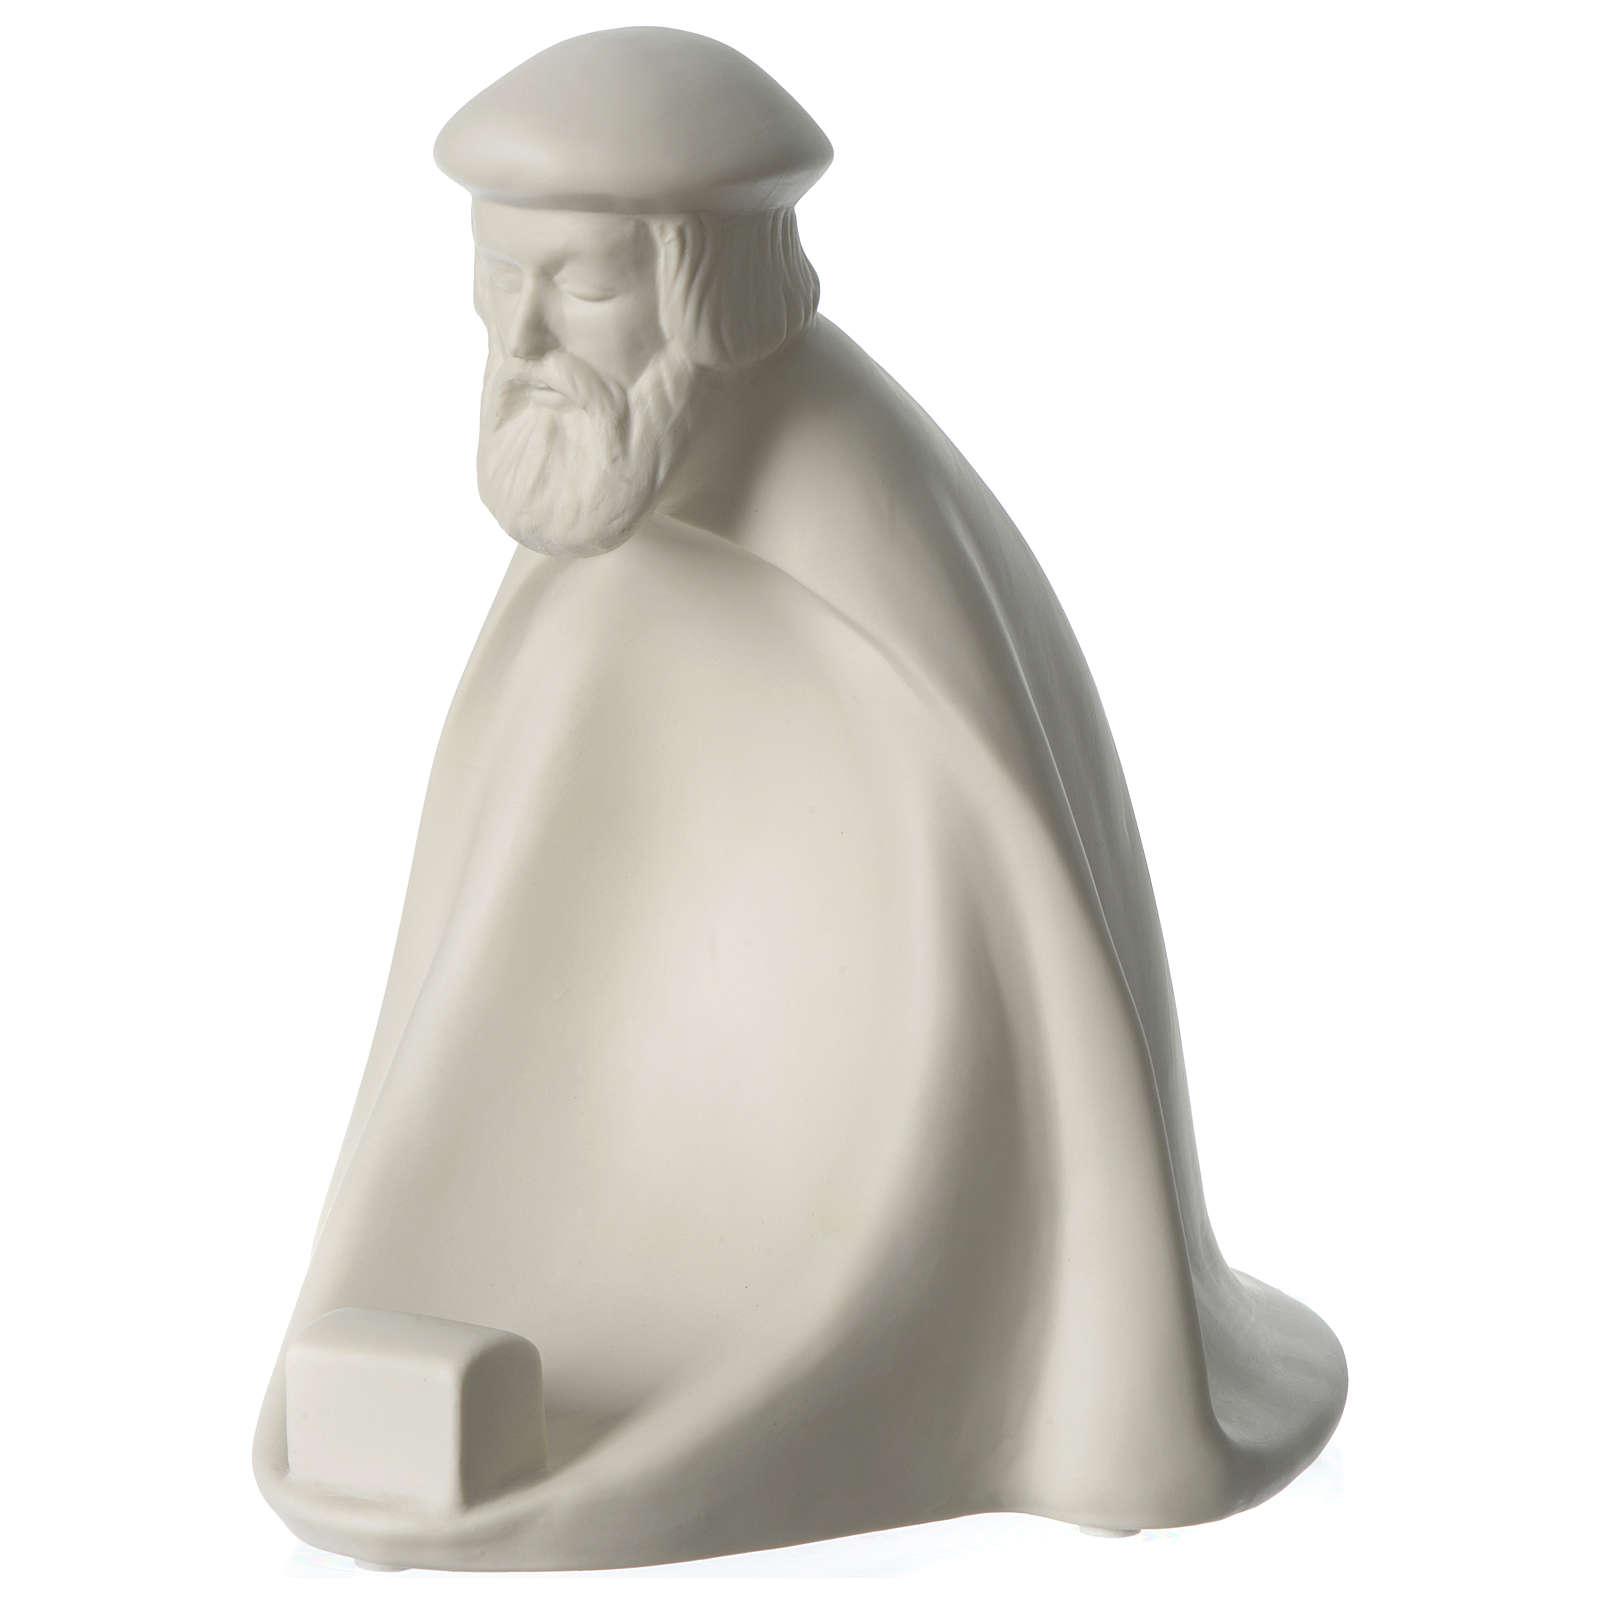 Rey prono porcelana para belén 55 cm de altura media Francesco Pinton 4